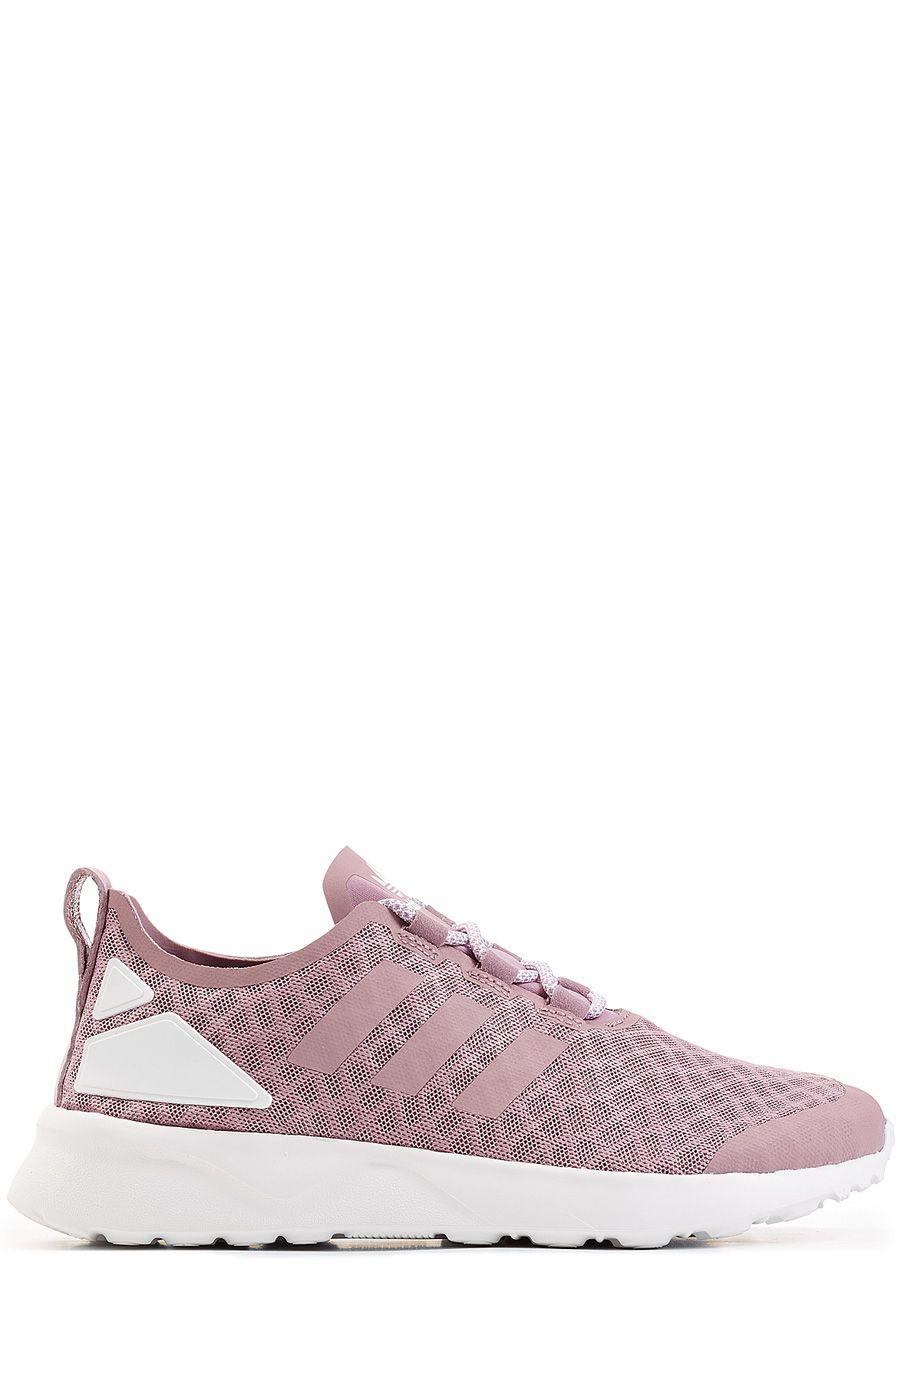 adidas zx flux adv verve w pink